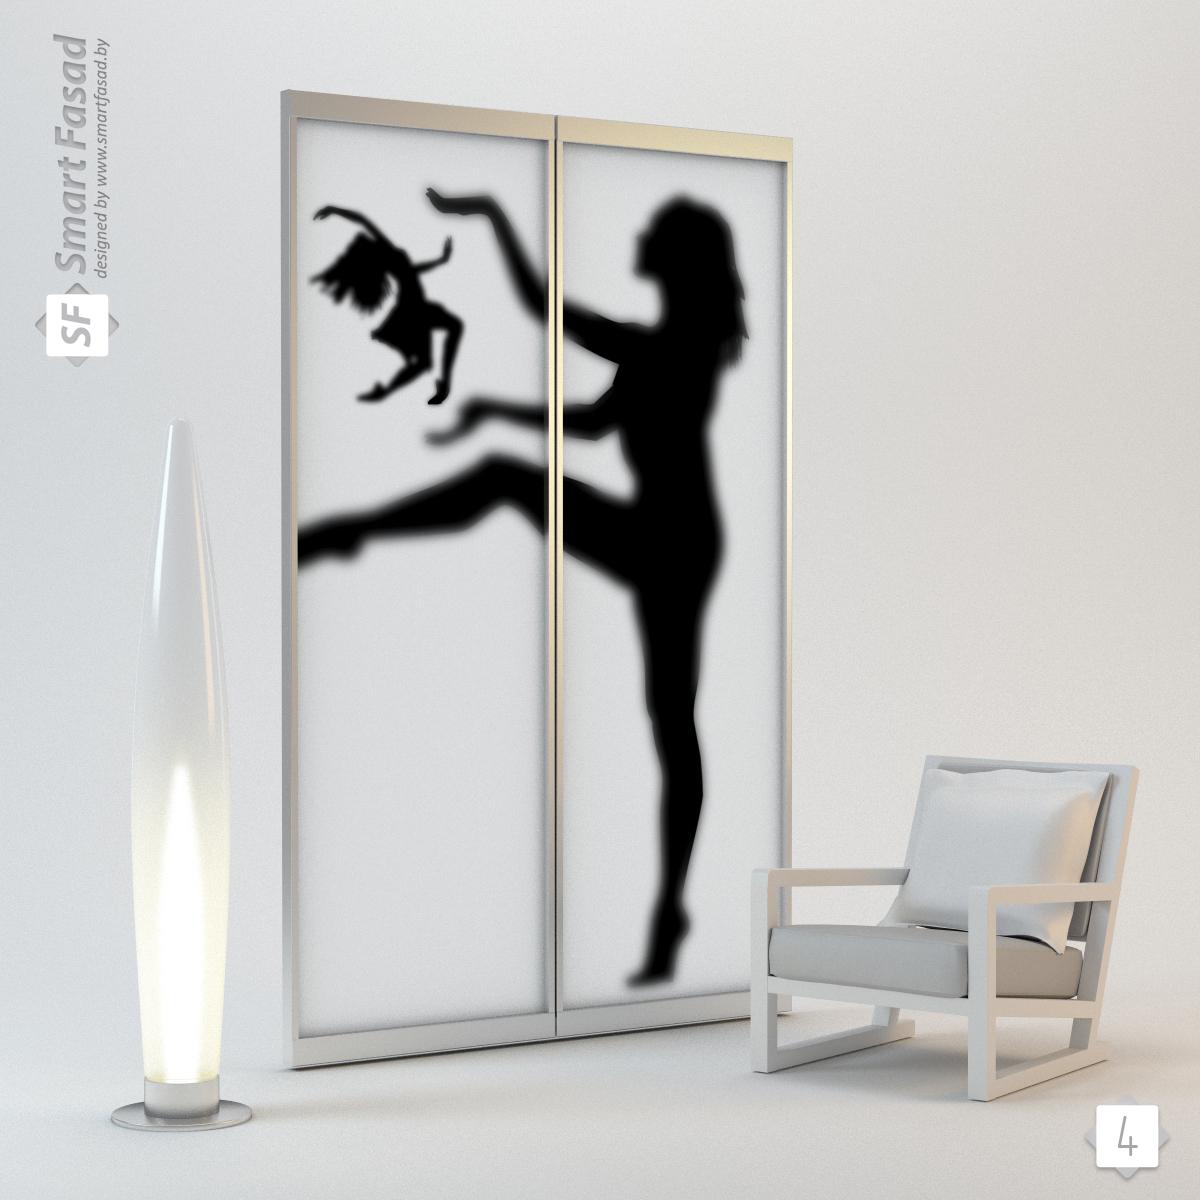 Doors,widefornat,Interior,concept,art,Silhouette